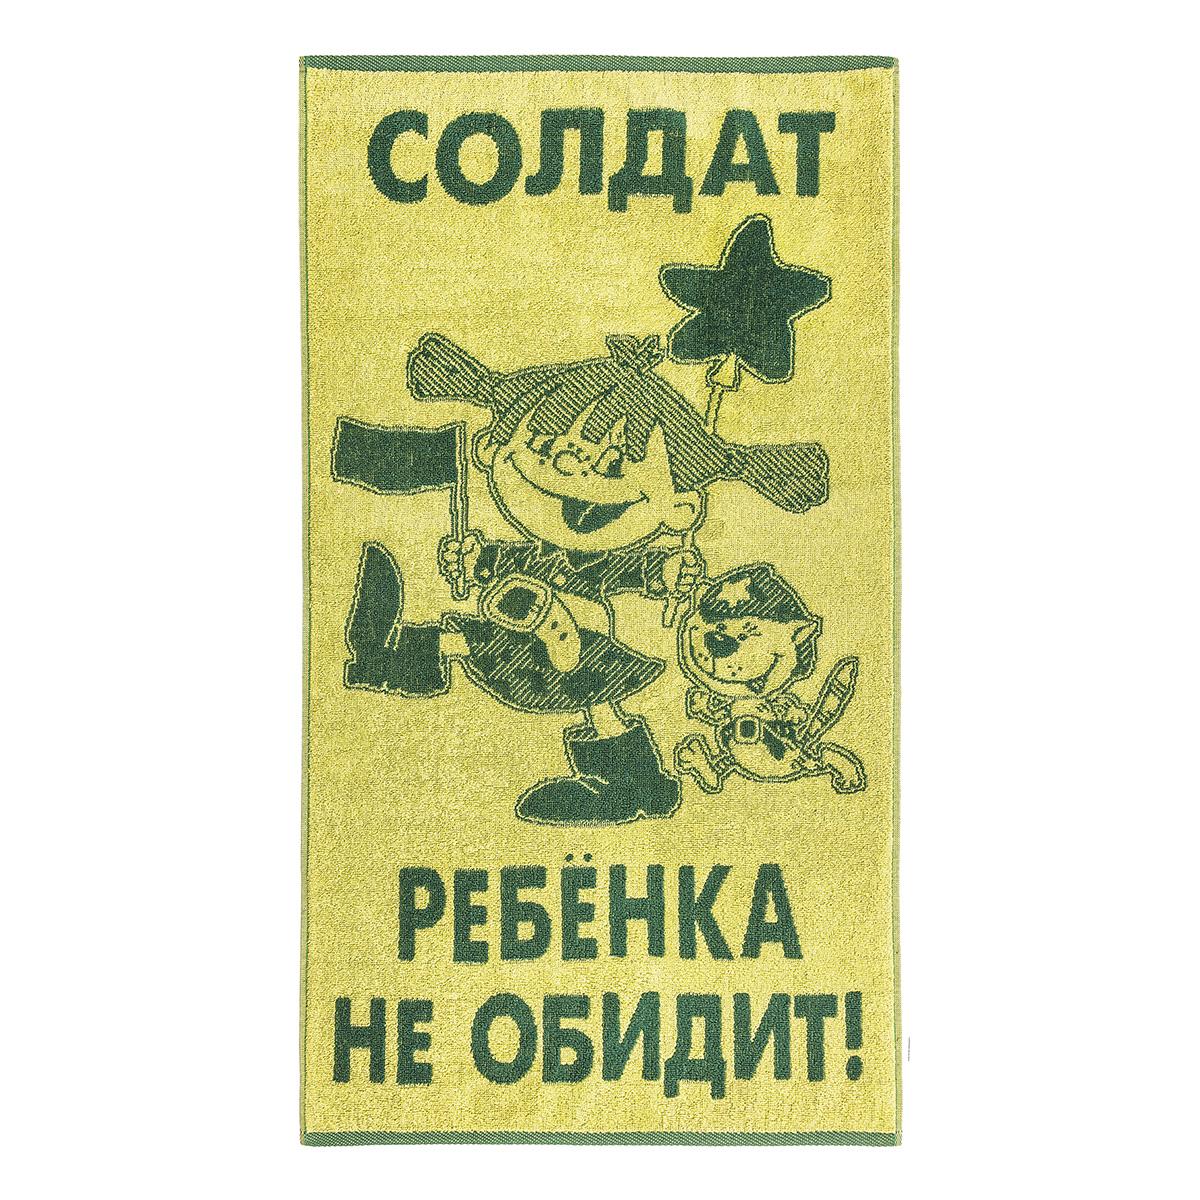 Полотенце Солдат ребенка не обидит!, размер 50х90 см.Махровые полотенца<br><br><br>Тип: Полотенце<br>Размер: 50х90<br>Материал: Махра